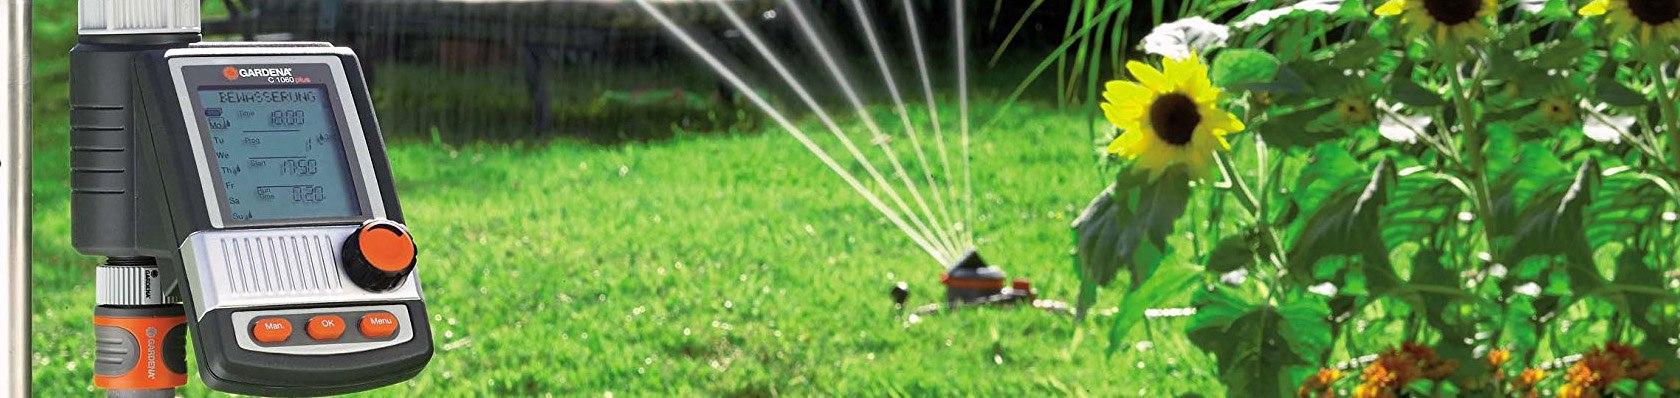 Bewässerungscomputer im Test auf ExpertenTesten.de